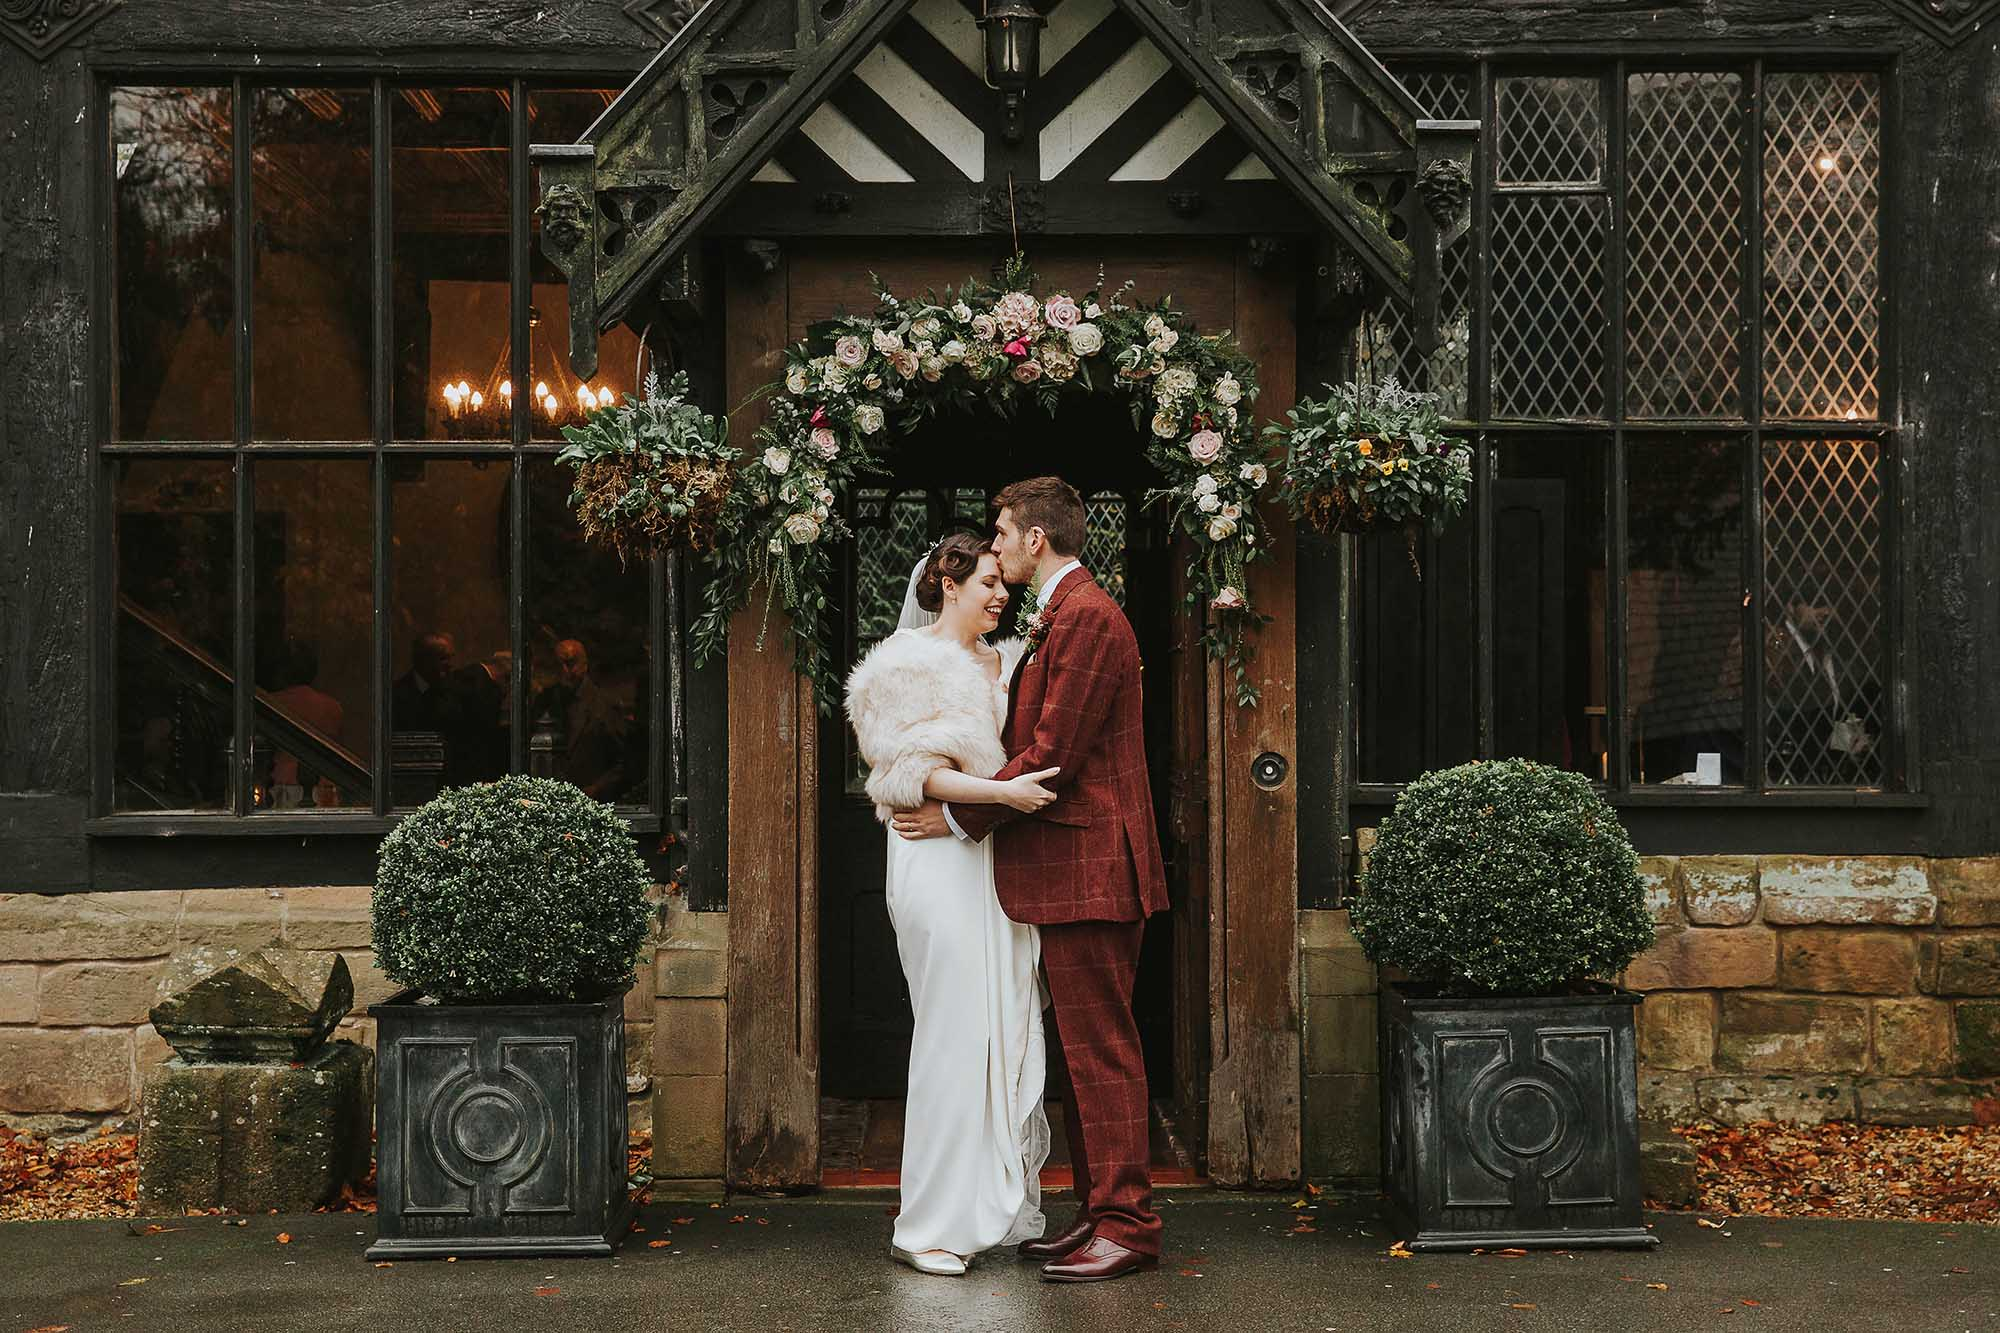 Samlesbury Hall bride and groom